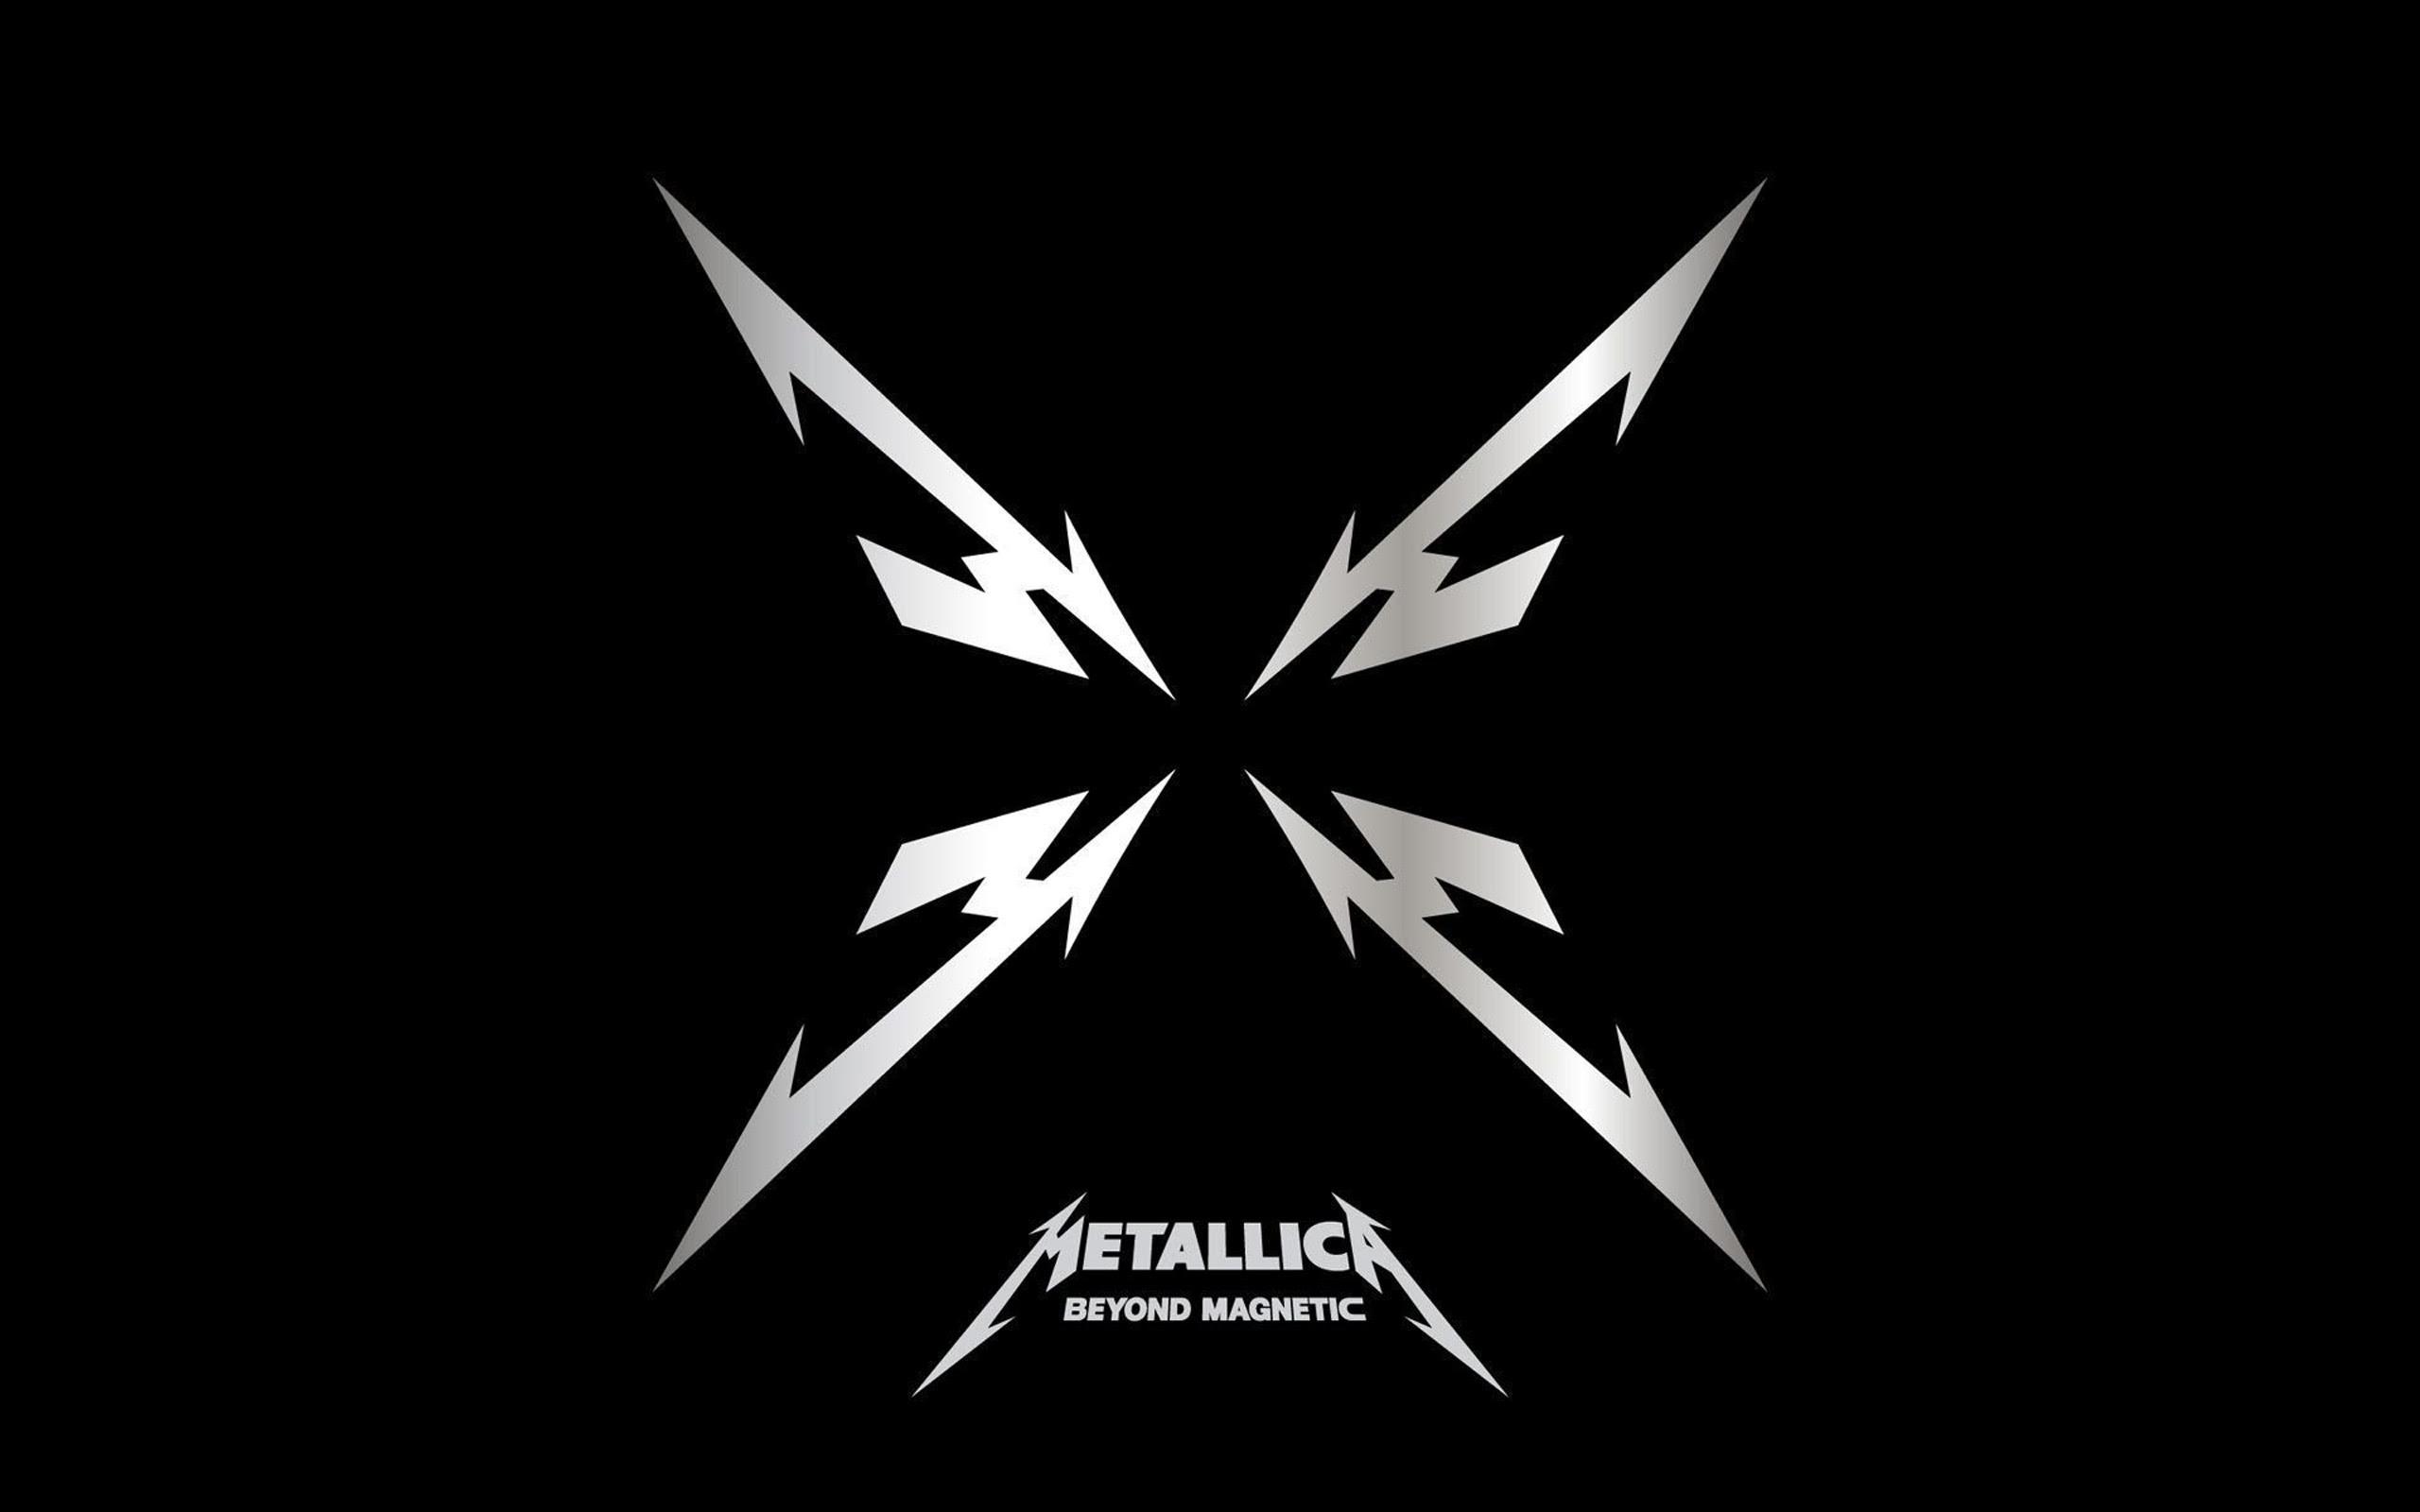 Metallica Wallpapers HD (69+ images)